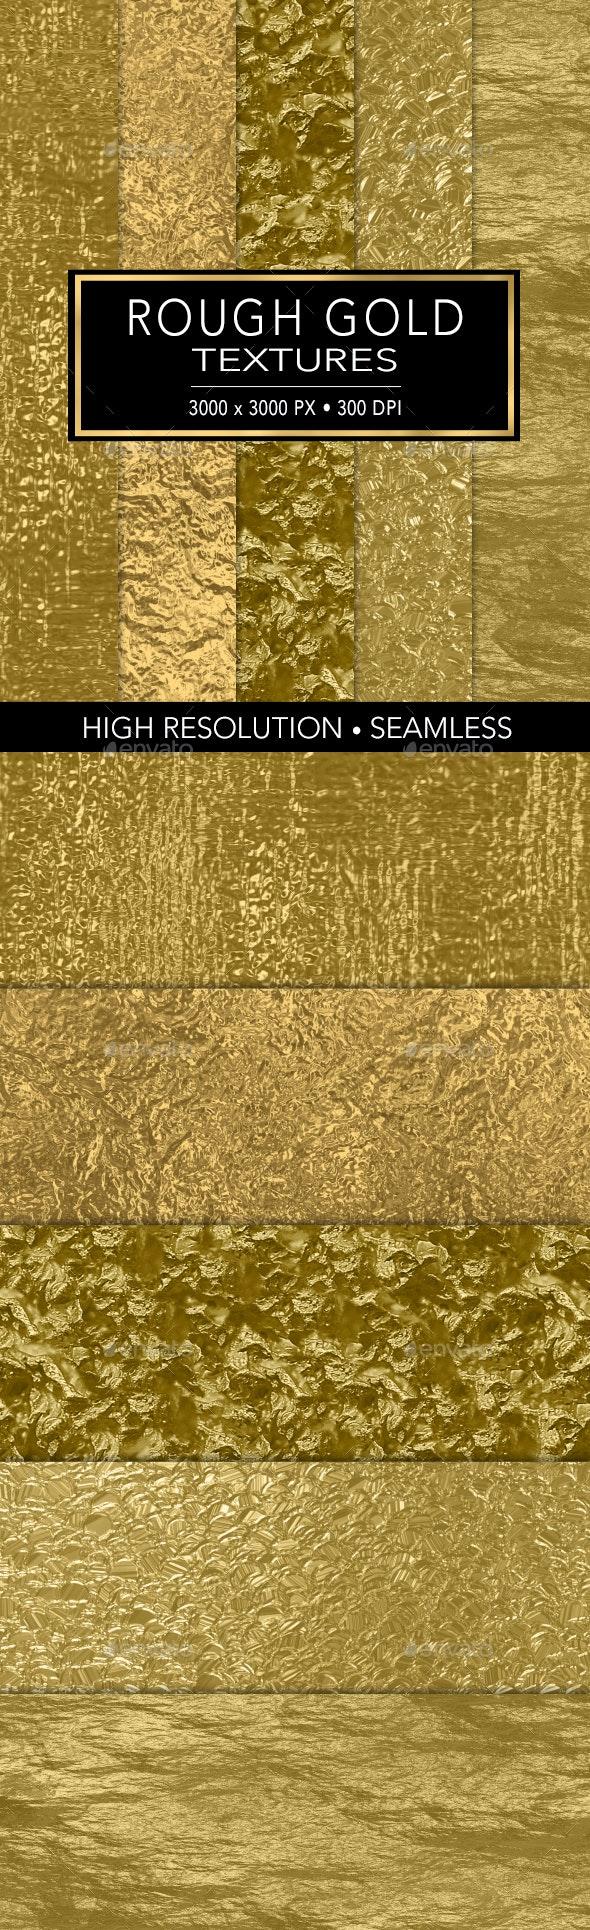 Rough Gold Textures